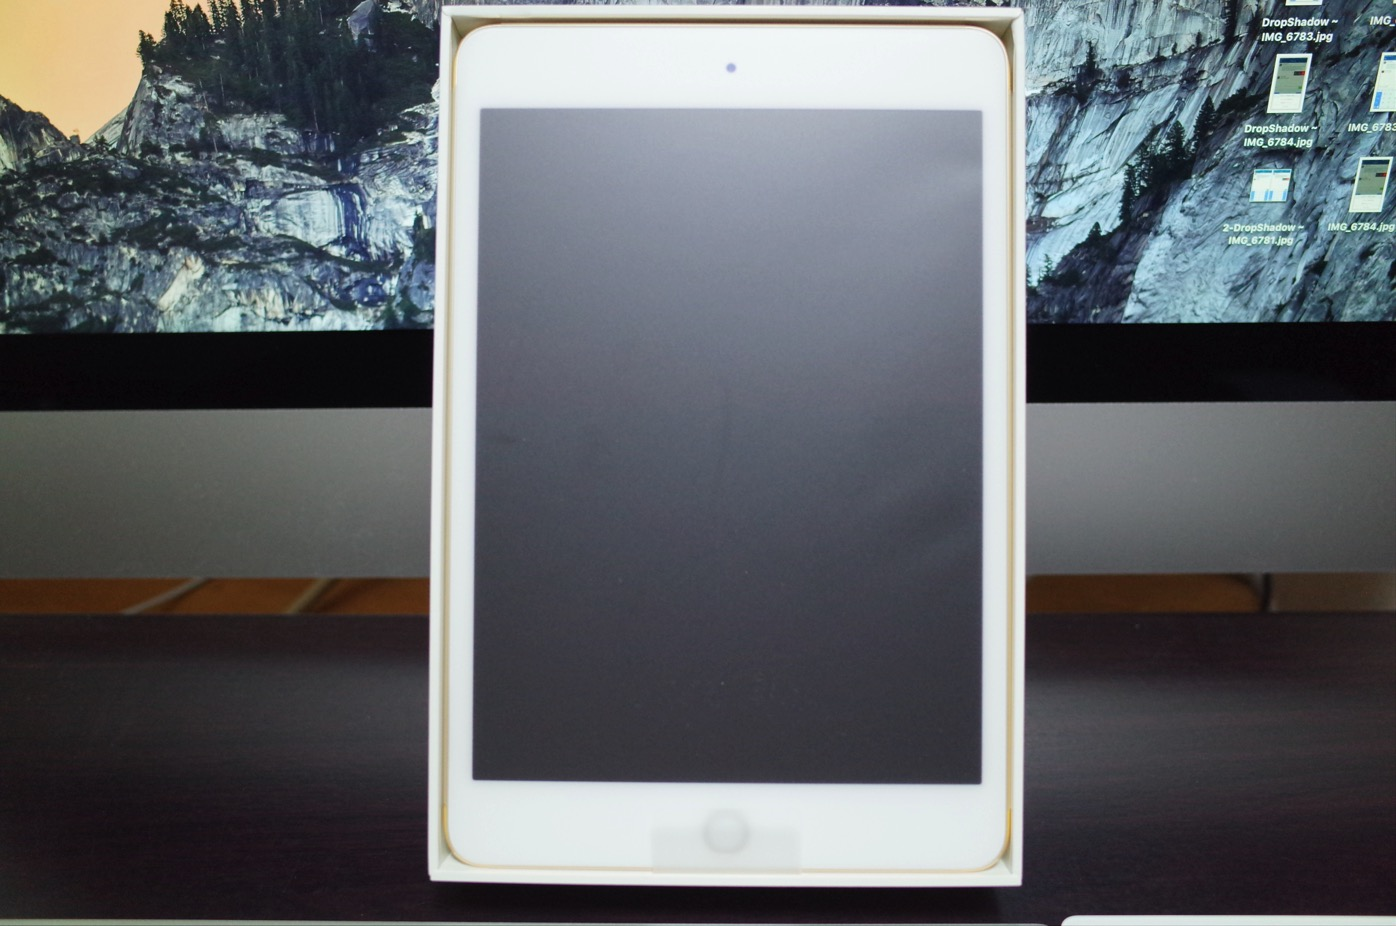 iPad mini 4-4